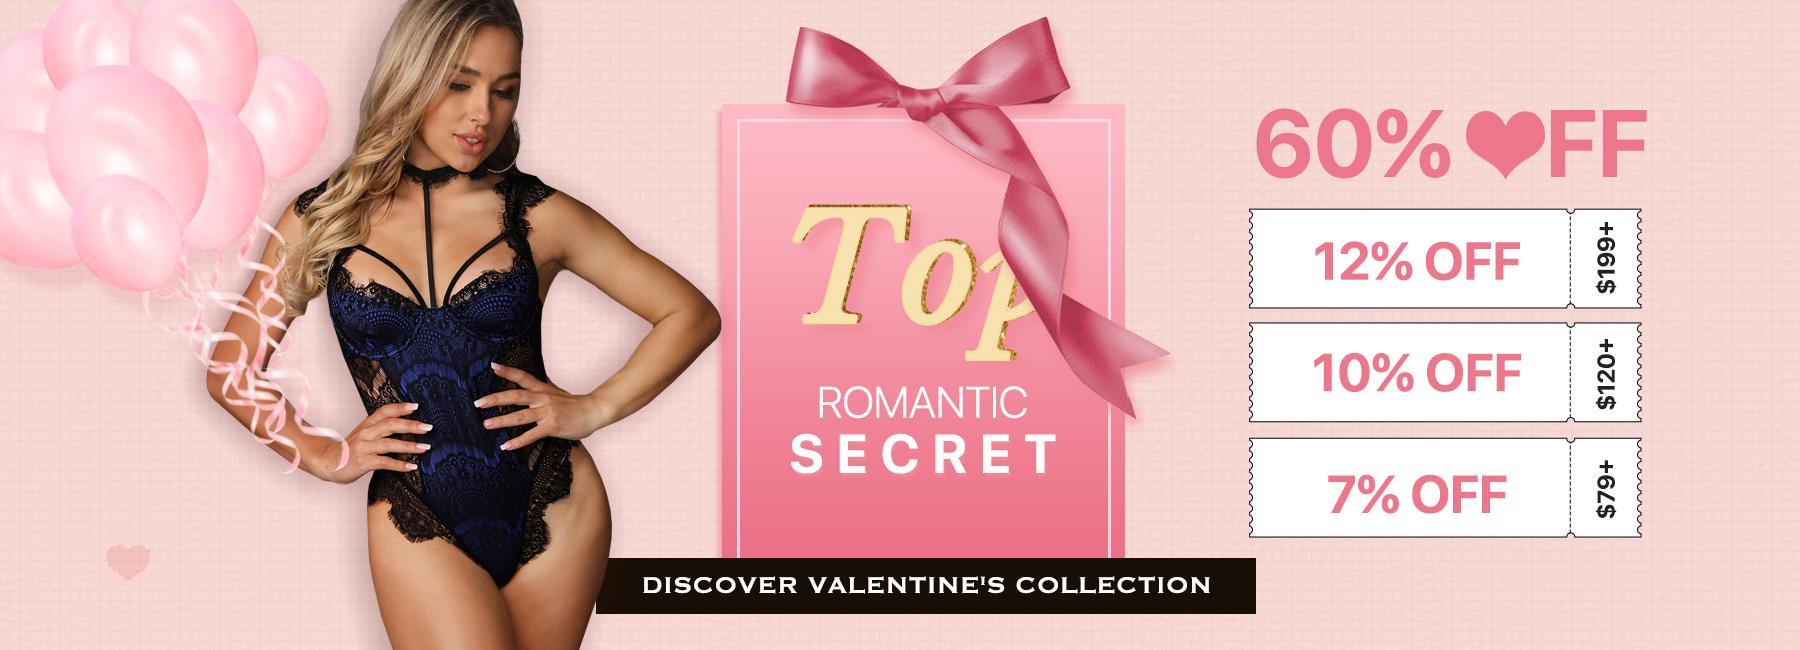 Top Romantic Secret